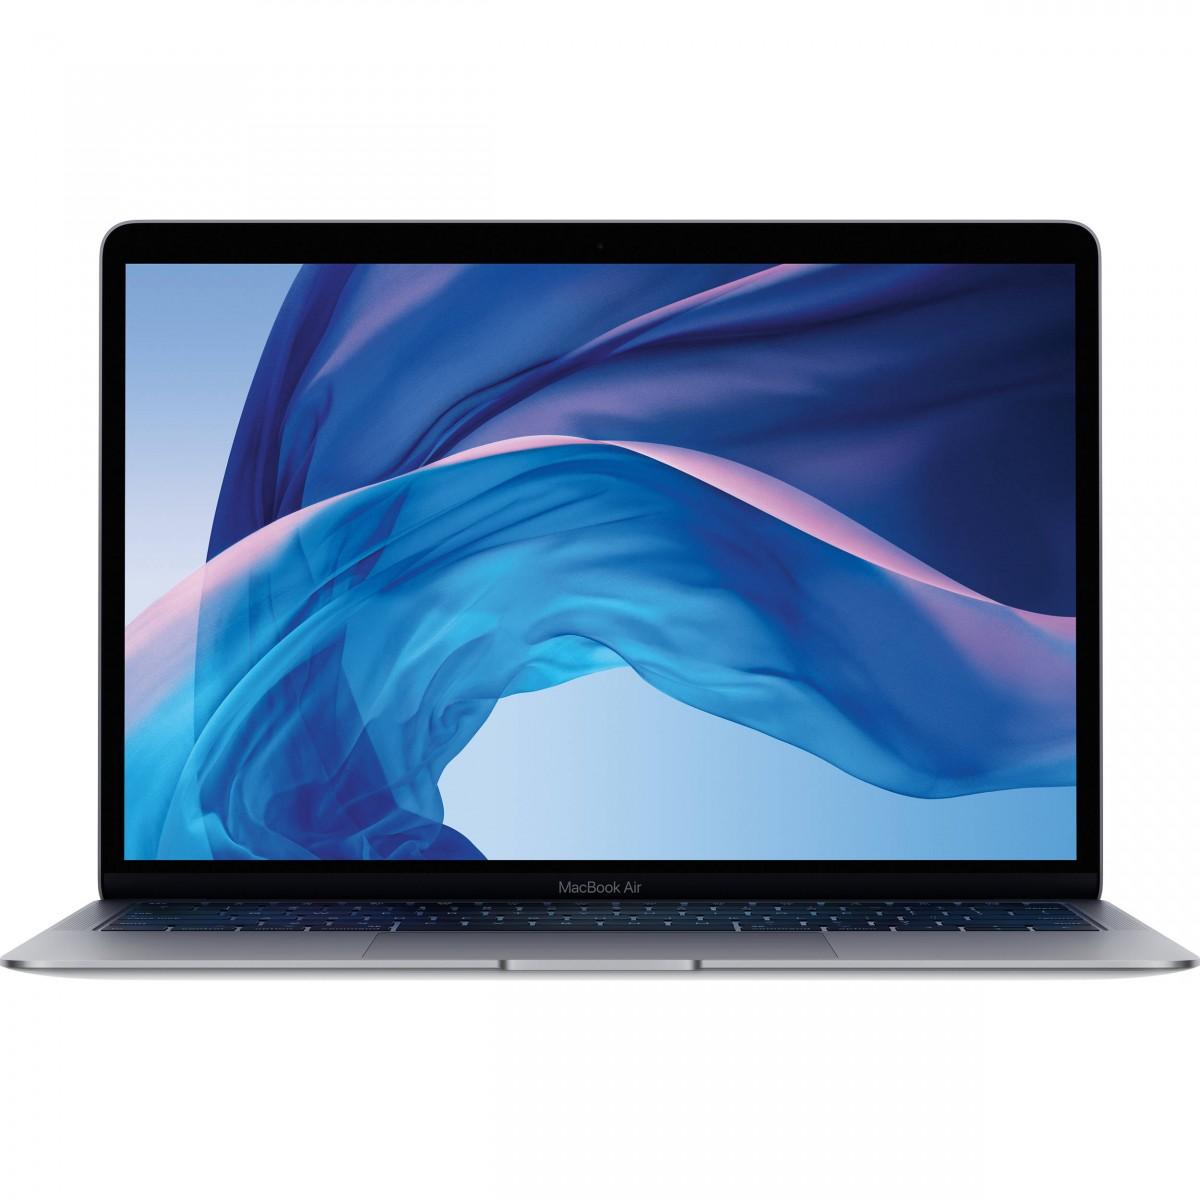 Apple MacBook Air 2018 MRE92CZ/A